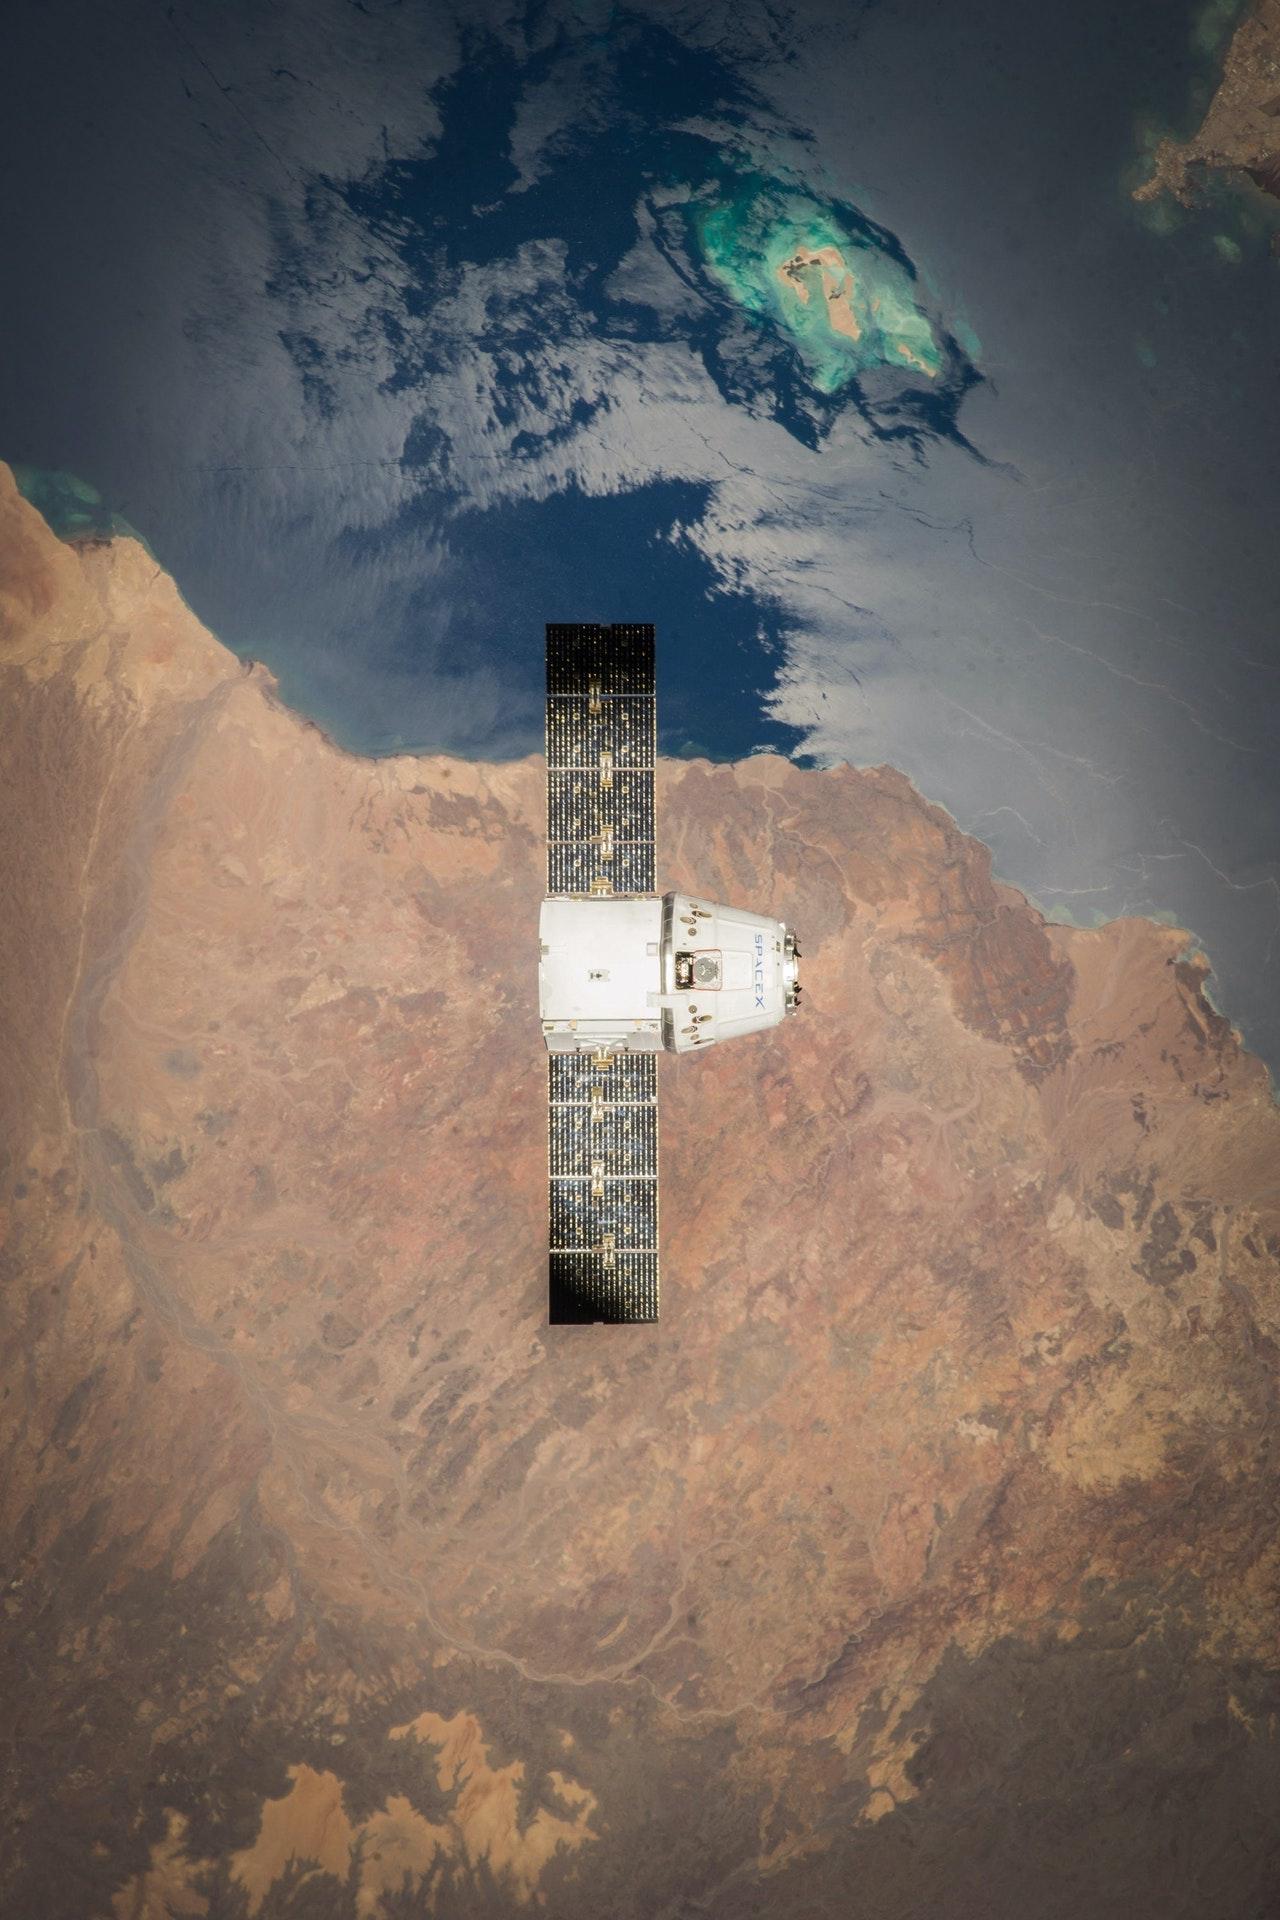 données satellites - images satellitaires